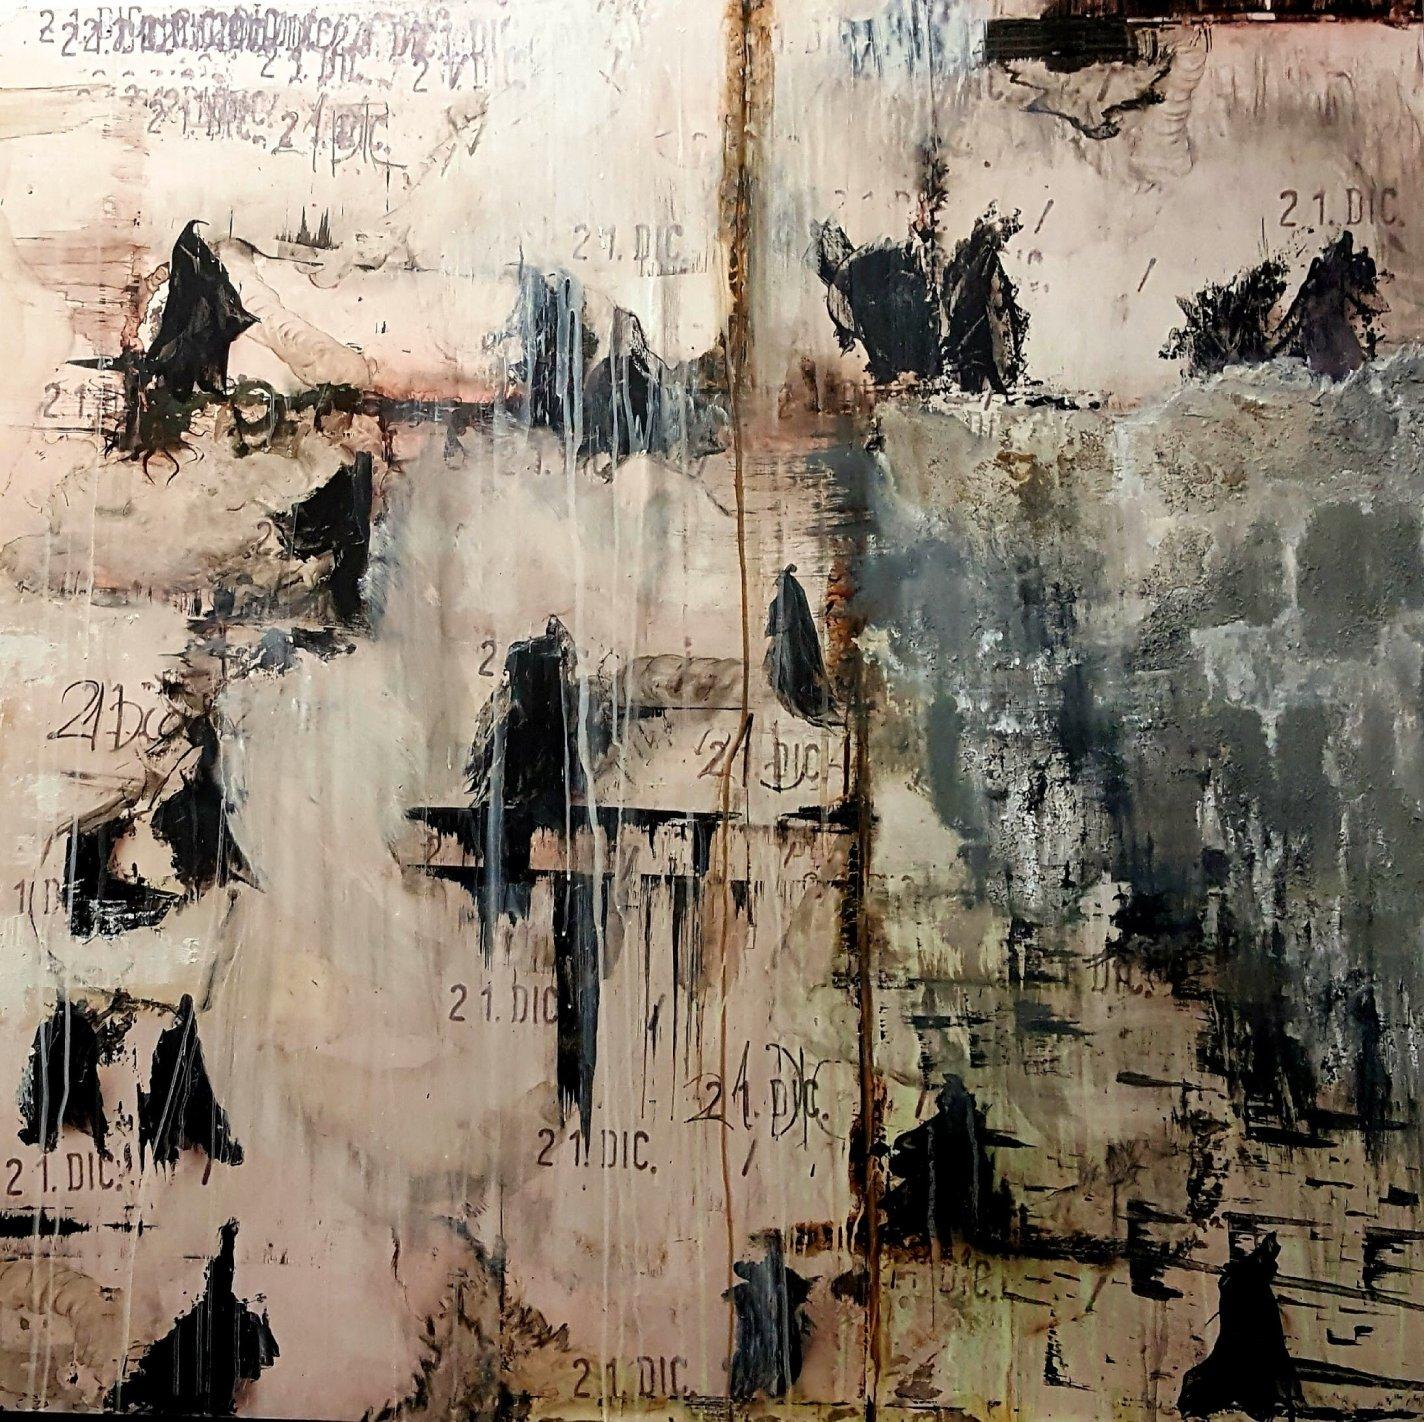 Murs d'equilibrisme. (2017) - Isabel Mur - Bel Mur